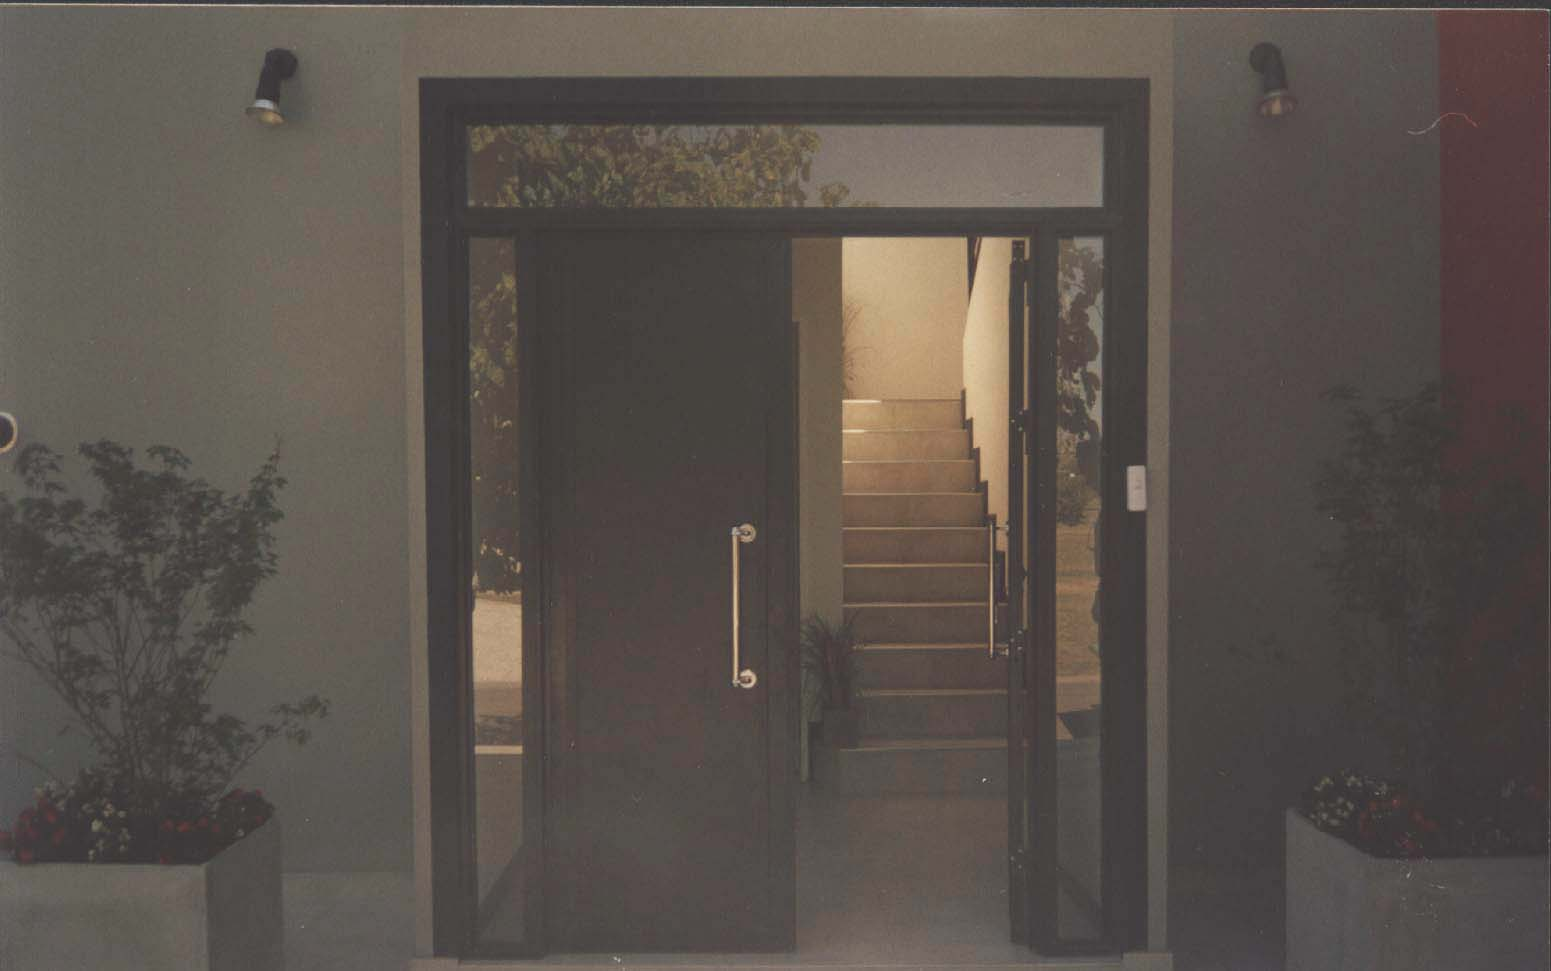 Puertas de aluminio para entrada de ba o for Puerta entrada vivienda